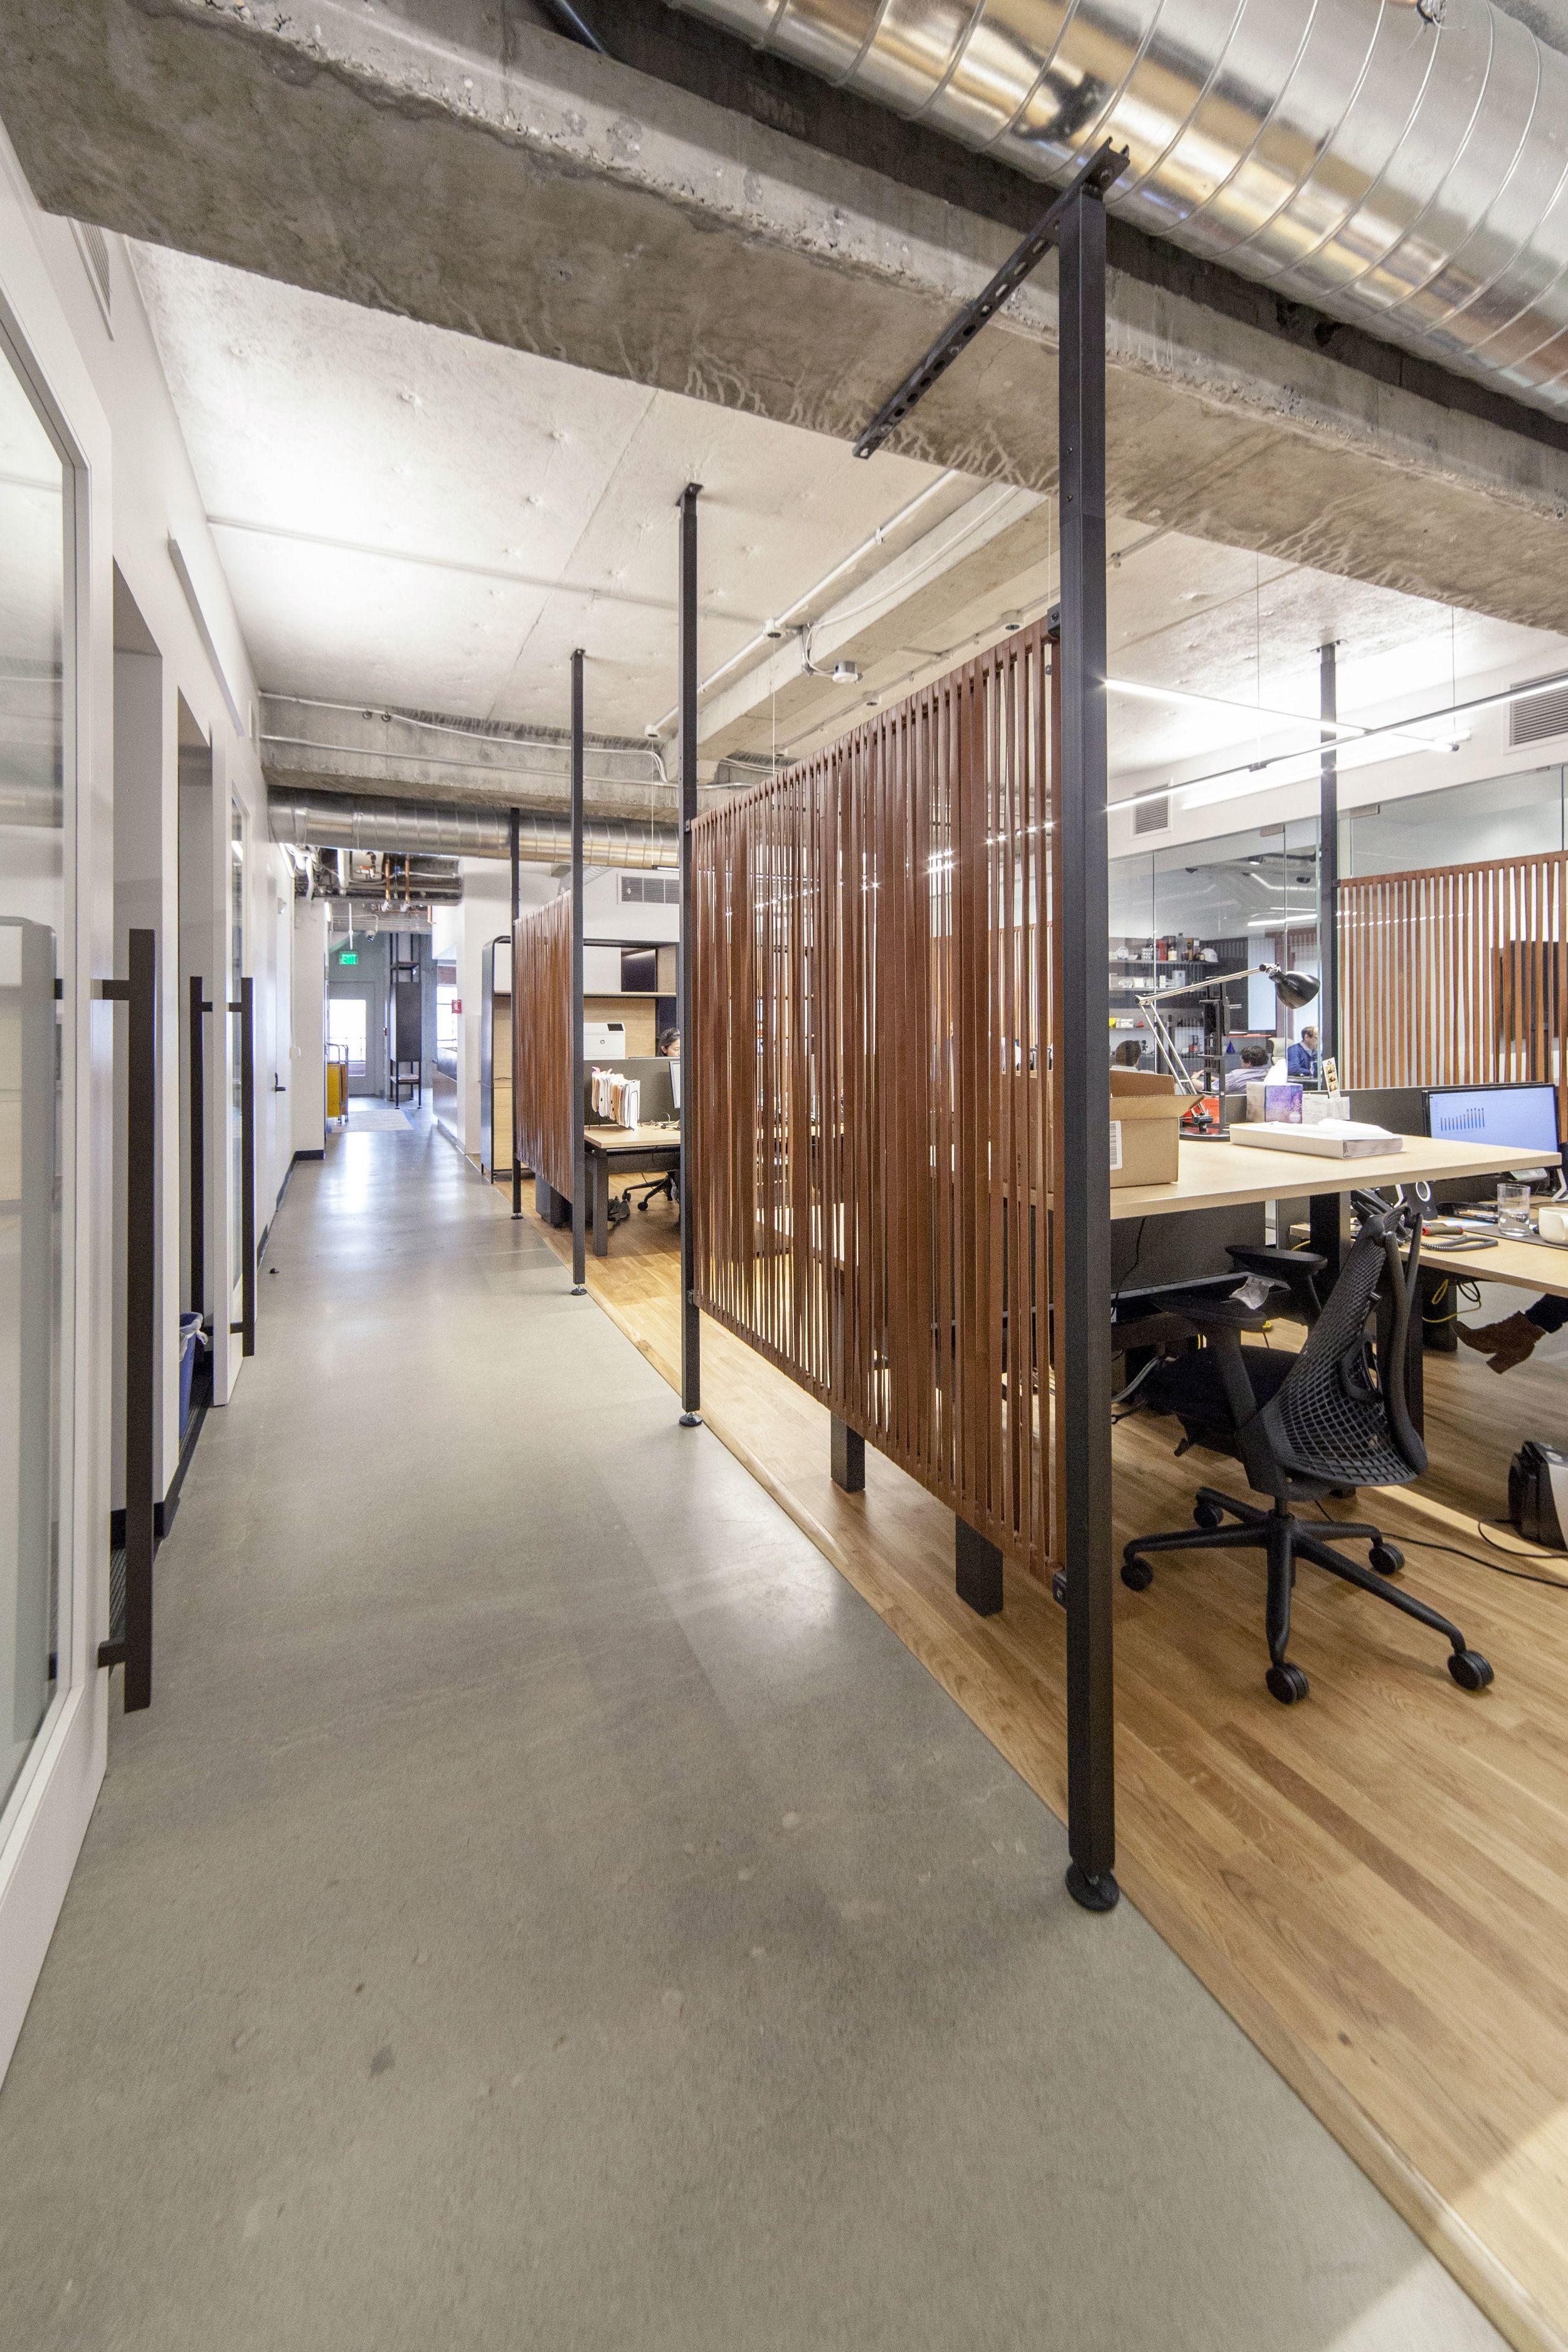 Leather strap divider walls by Synecdoche Design Studio for Rapt Studio